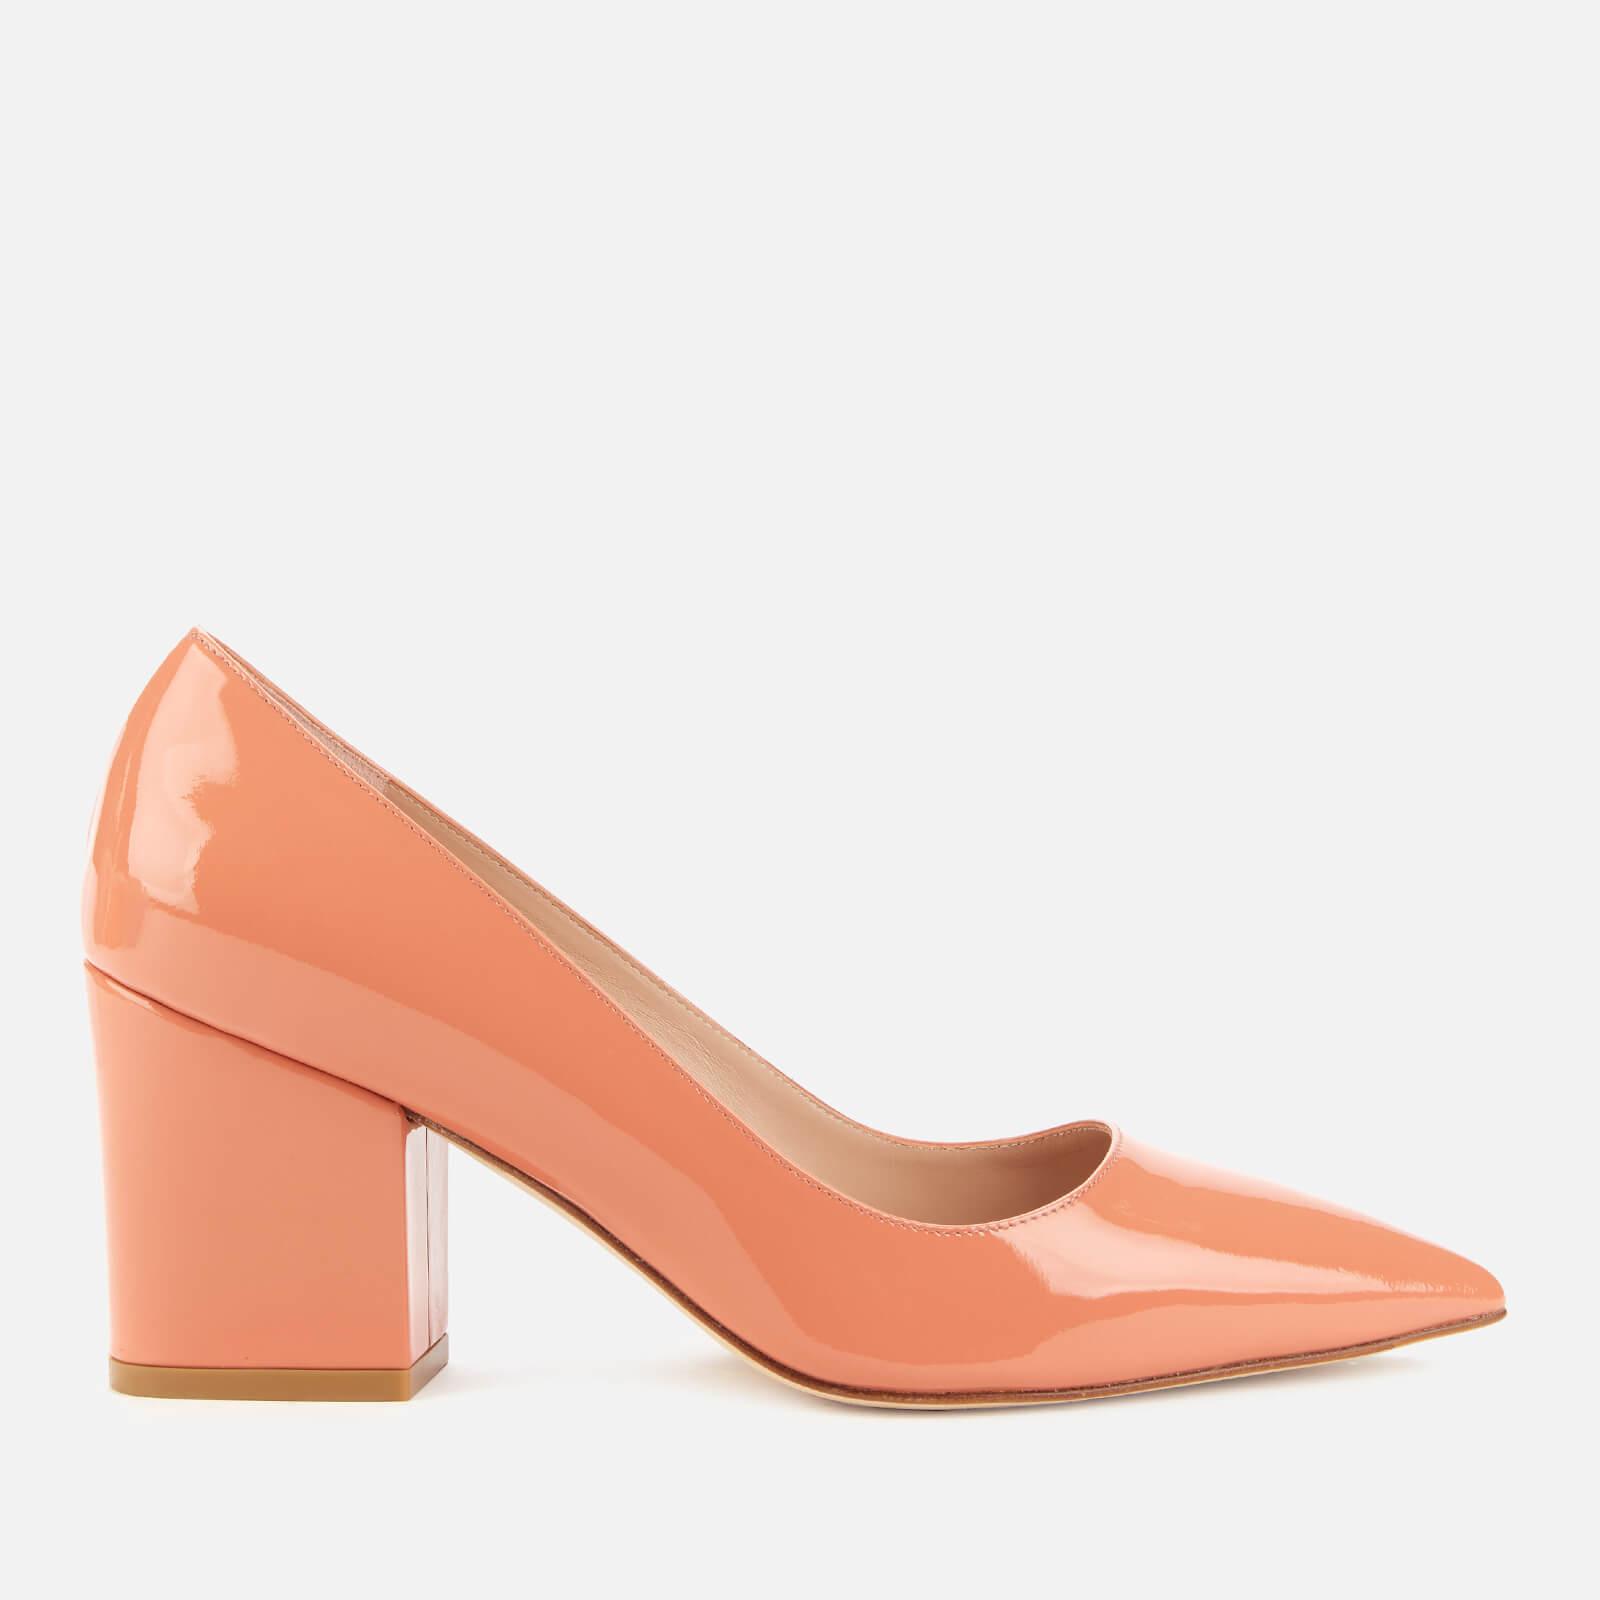 Stuart Weitzman Women's Luna 75 Patent Block Heeled Court Shoes - Petal - Uk 3